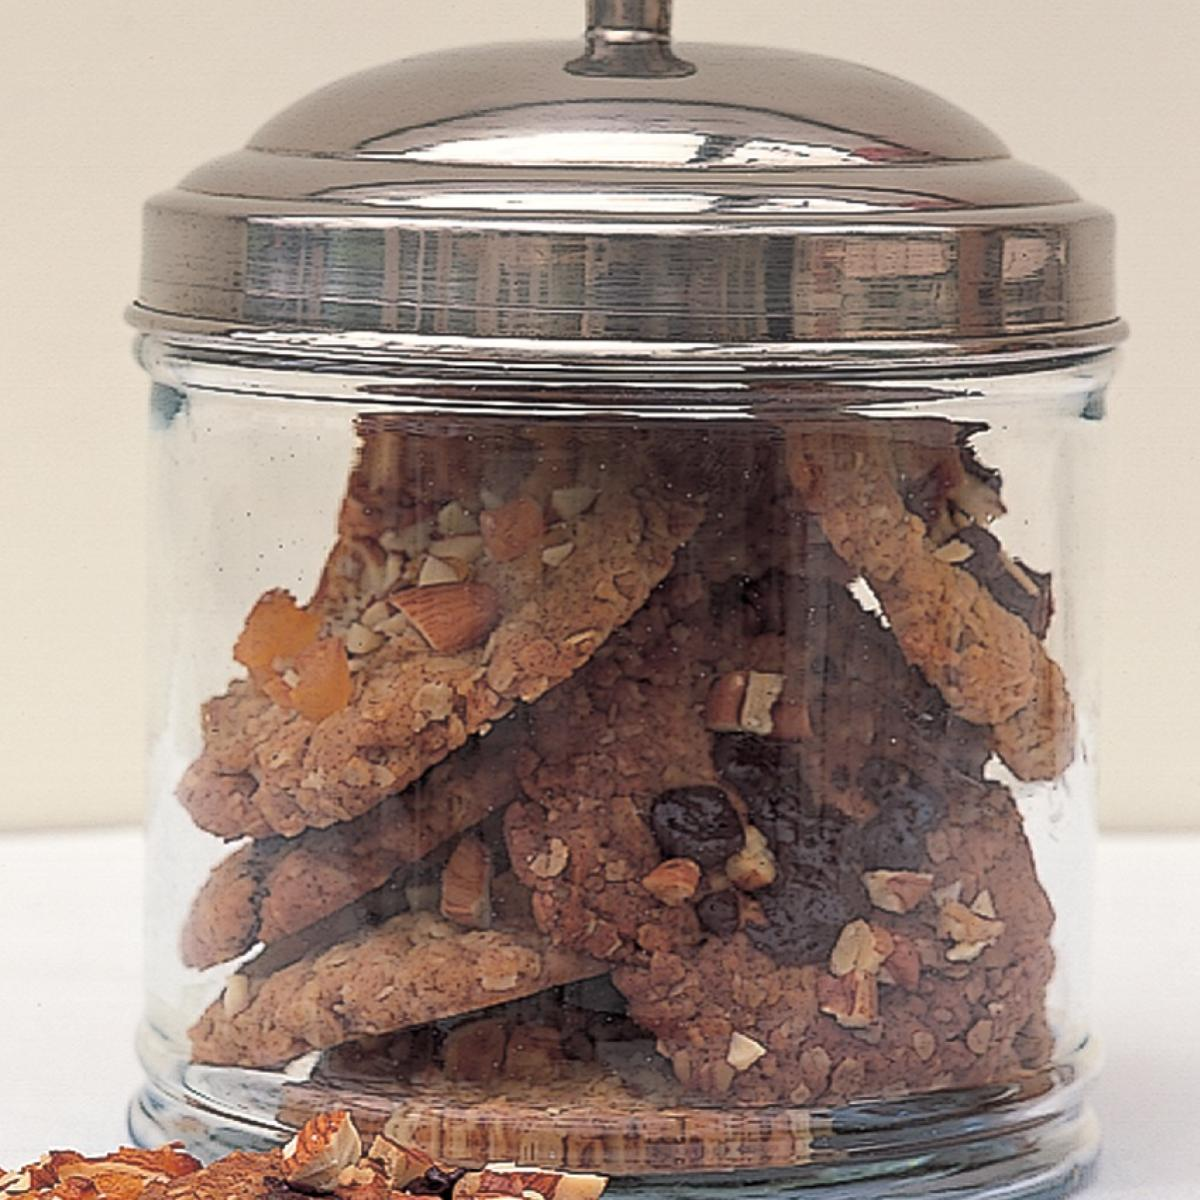 Chocolate chocolate almond crunchies